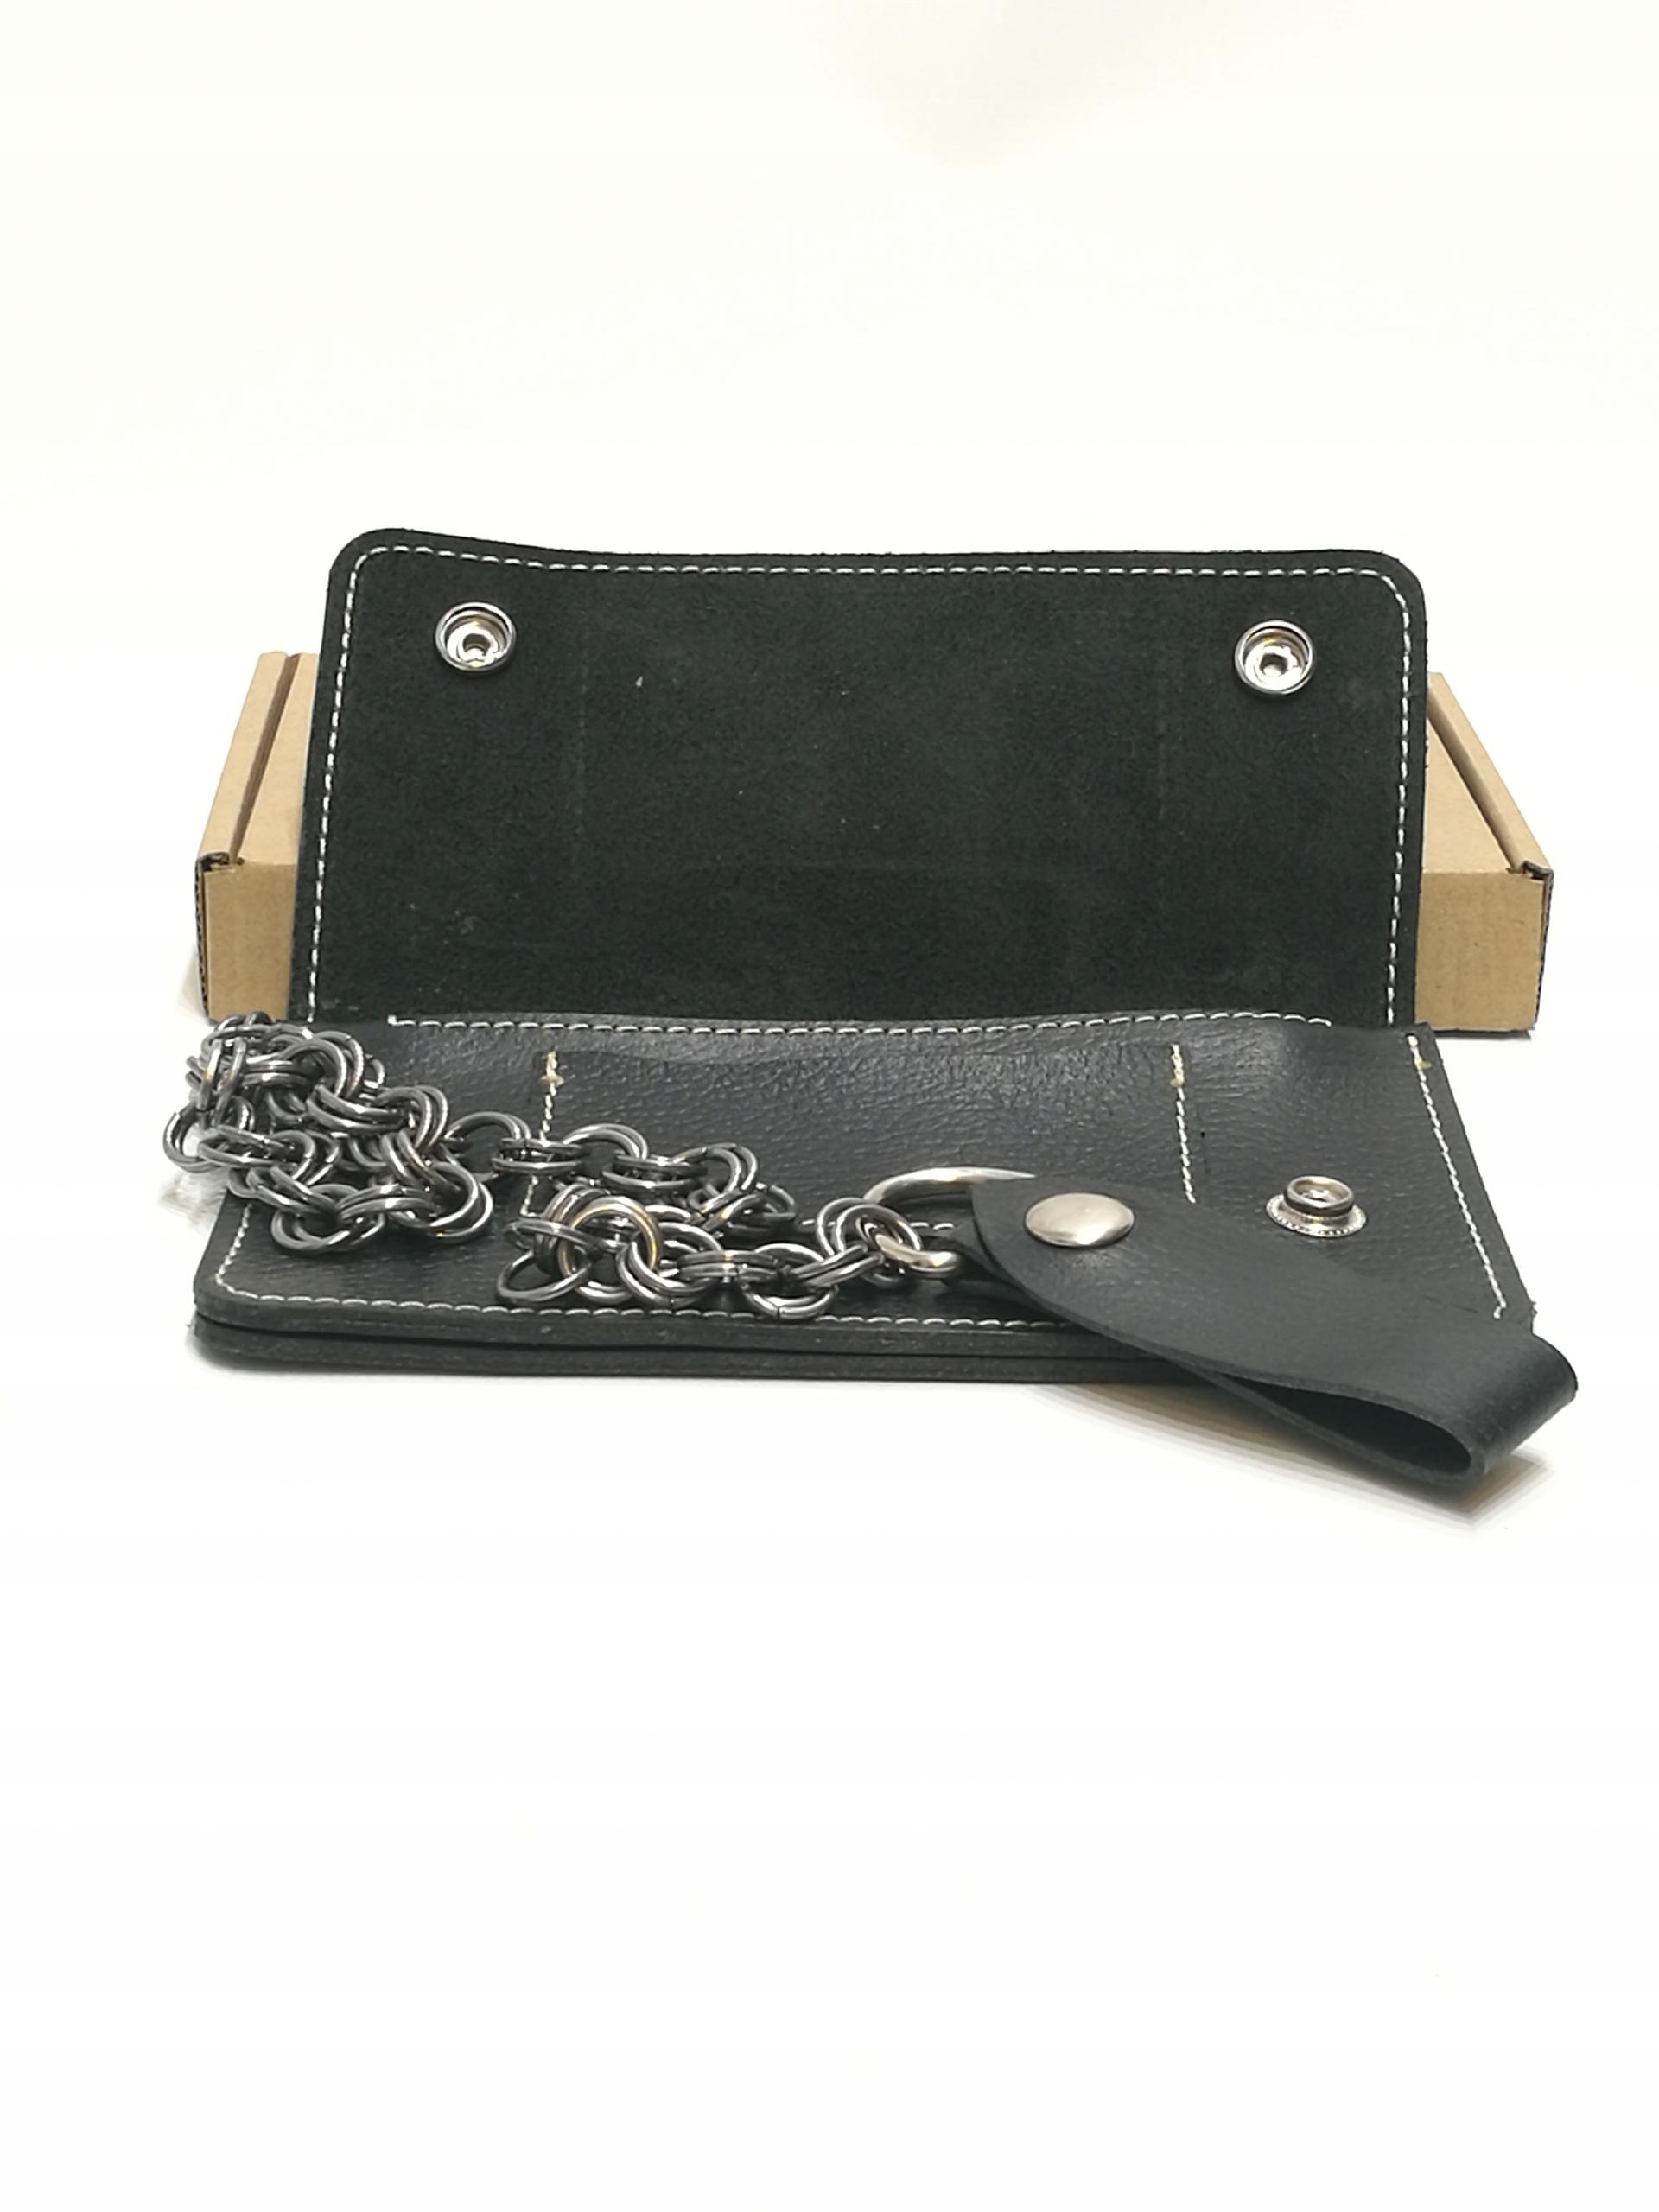 6446e47bc1c1f Skórzany portfel z łańcuchem handmade SQRATORIUM - 7685547700 ...